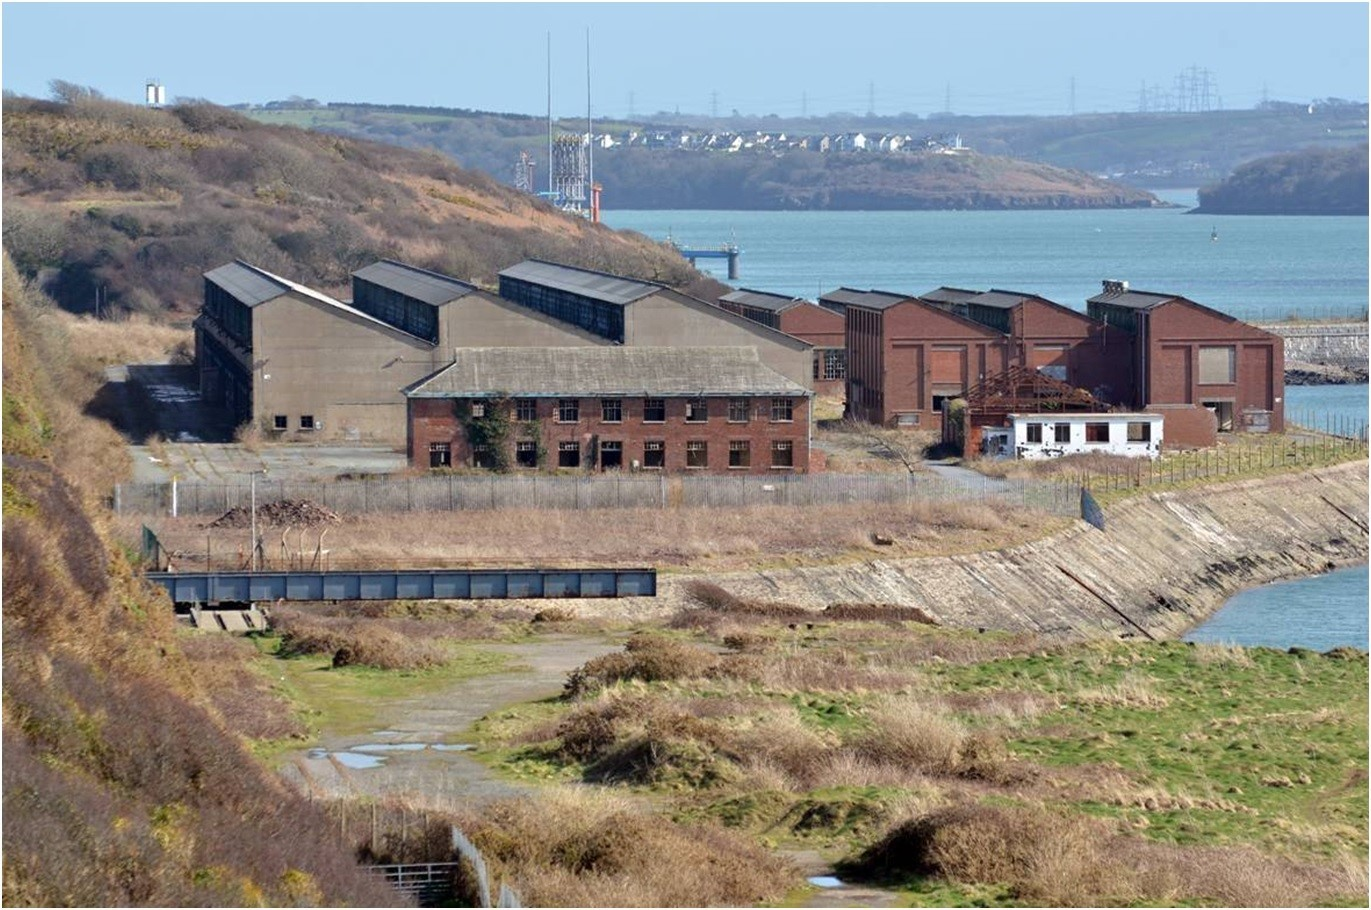 Energy firm Egnedol has presented its plans for Blackbridge. PICTURE: Martin Cavaney.